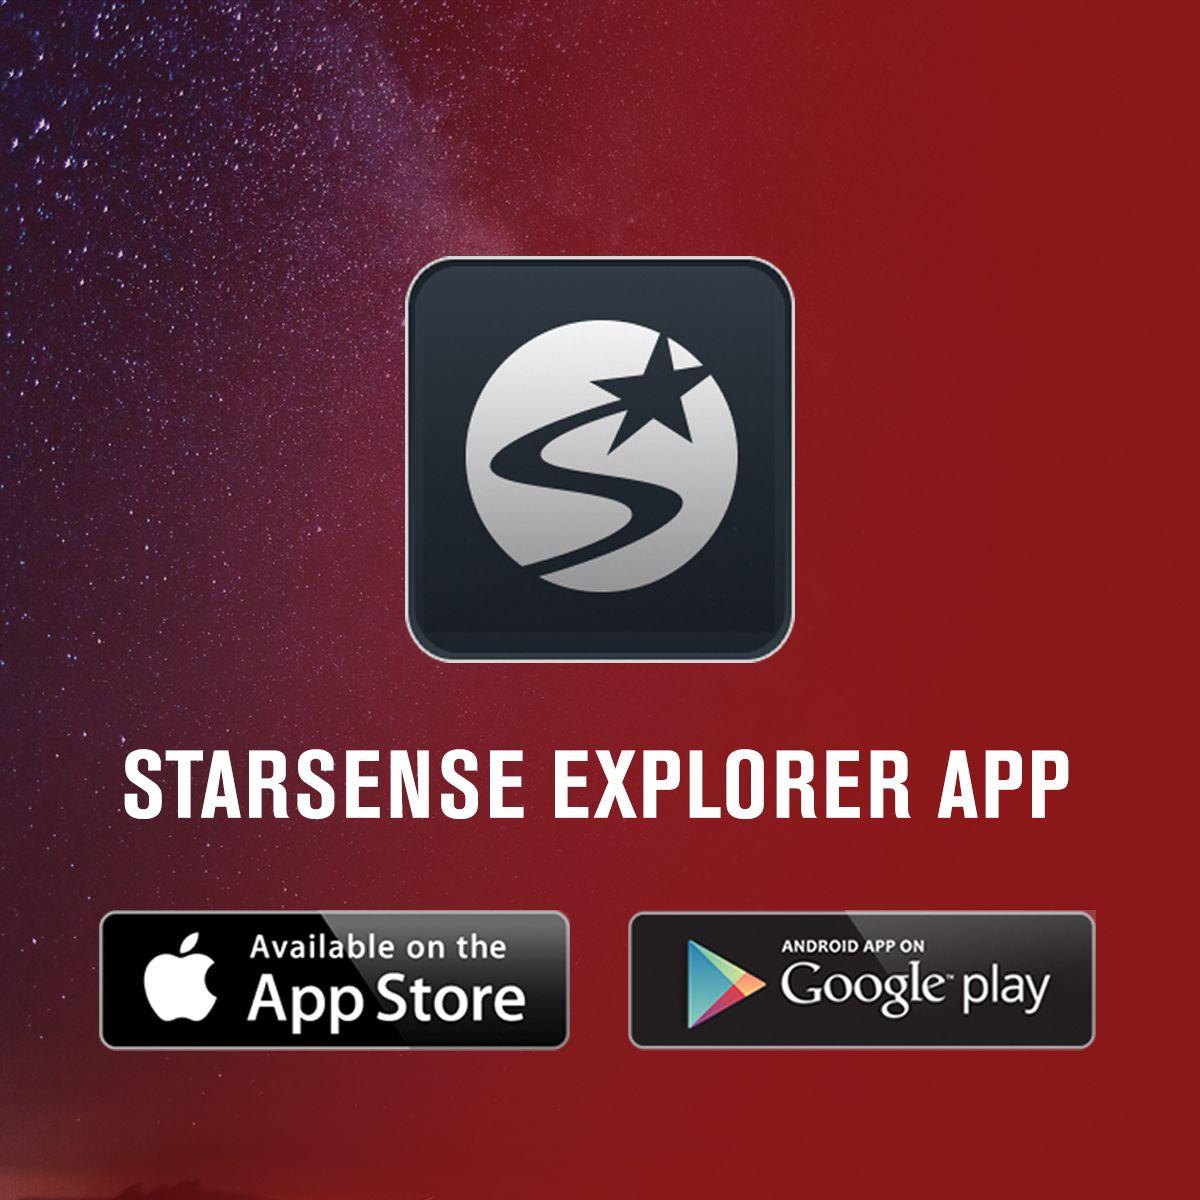 What makes StarSense Explorer different? Its patent